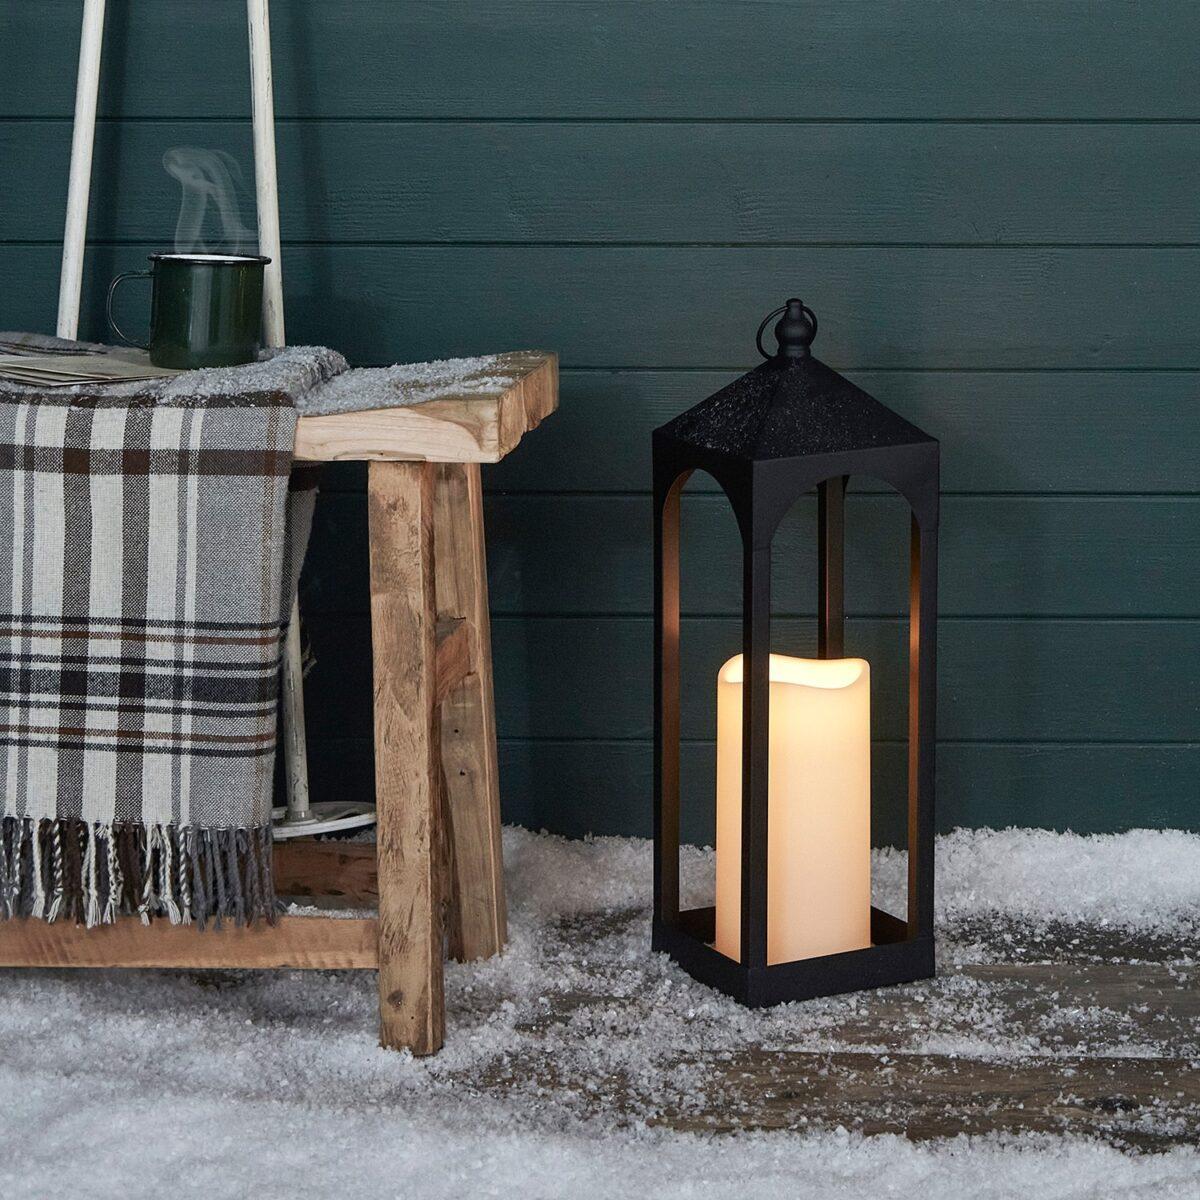 lighting-the-veranda-project-and-ideas-23